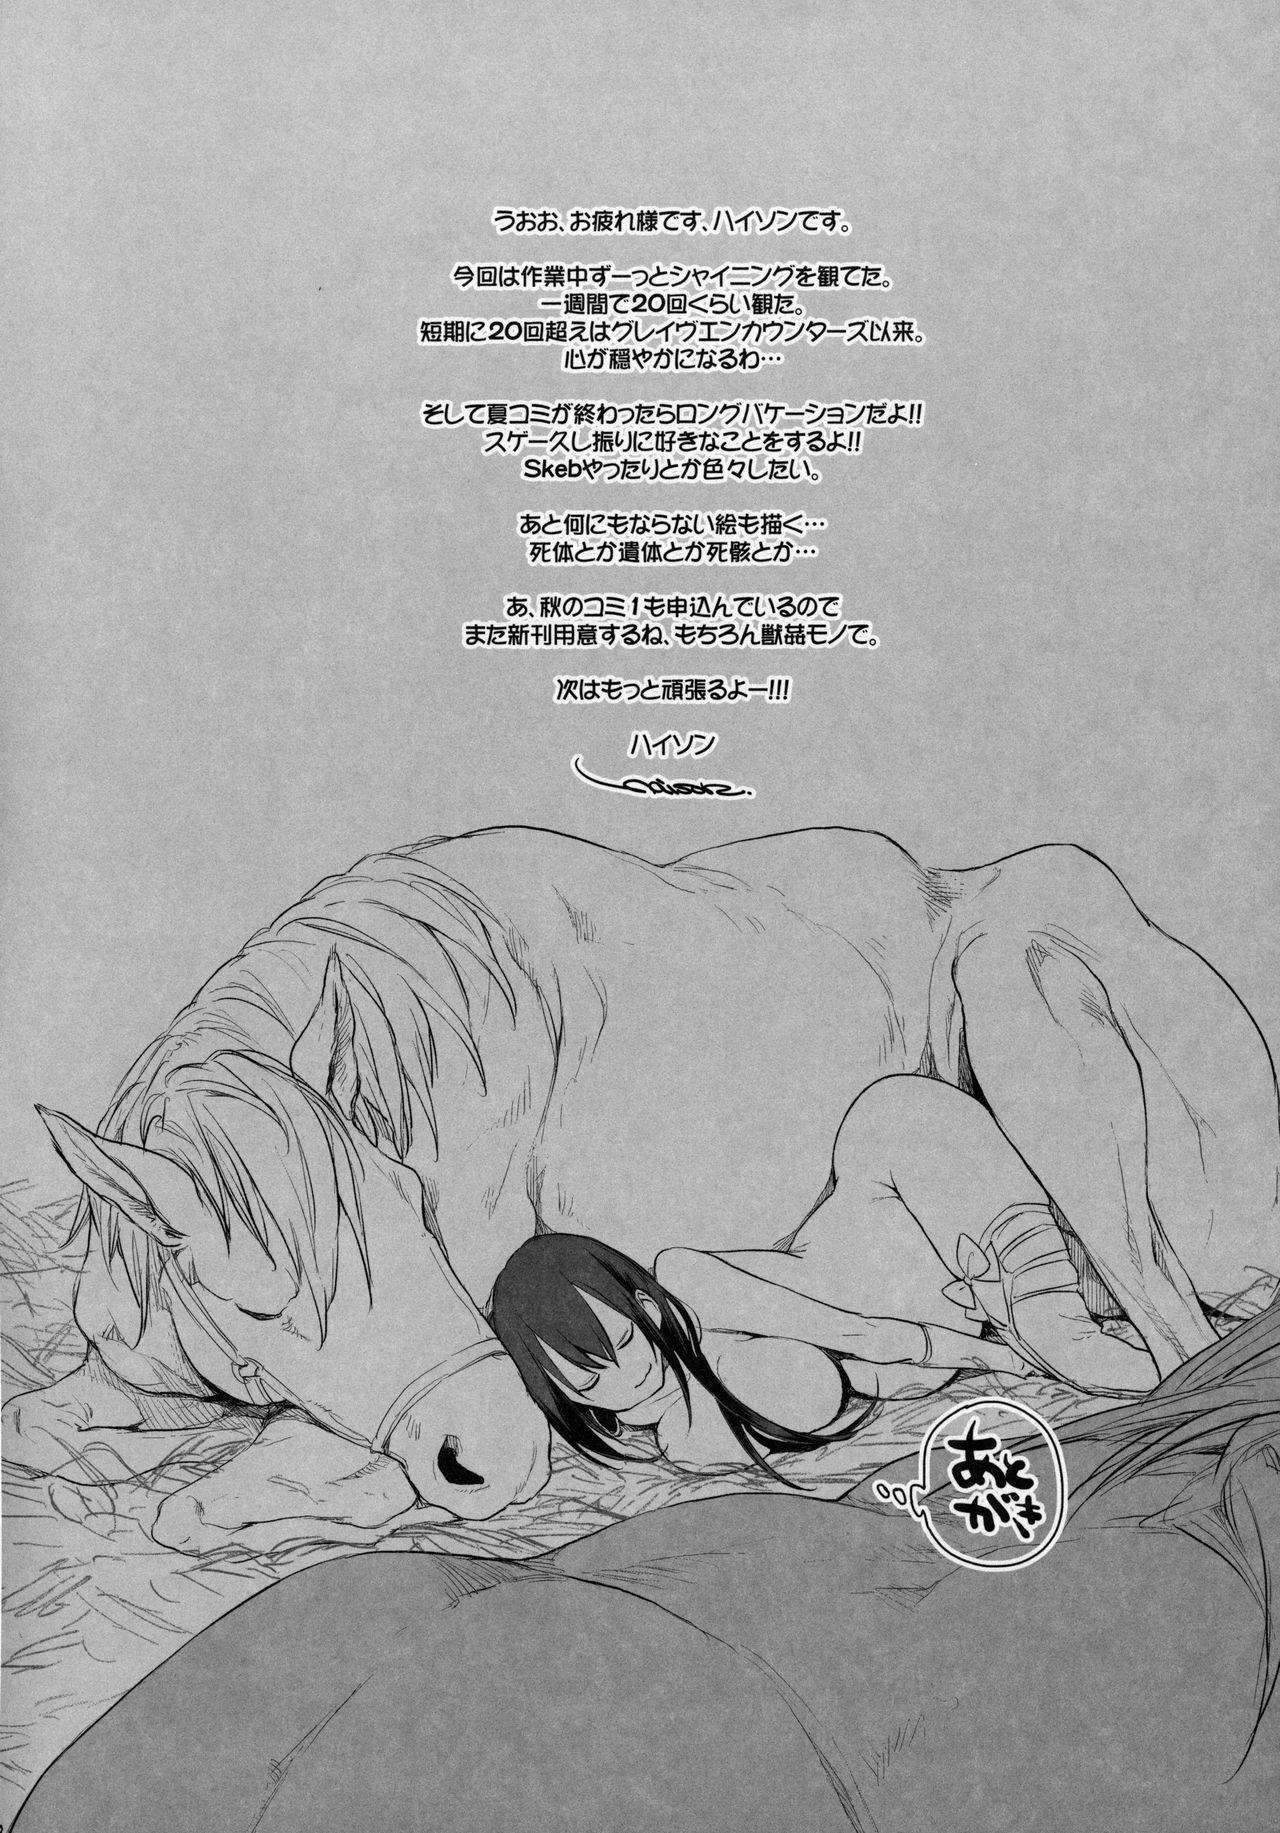 Sanzou-chan to Uma 3 18